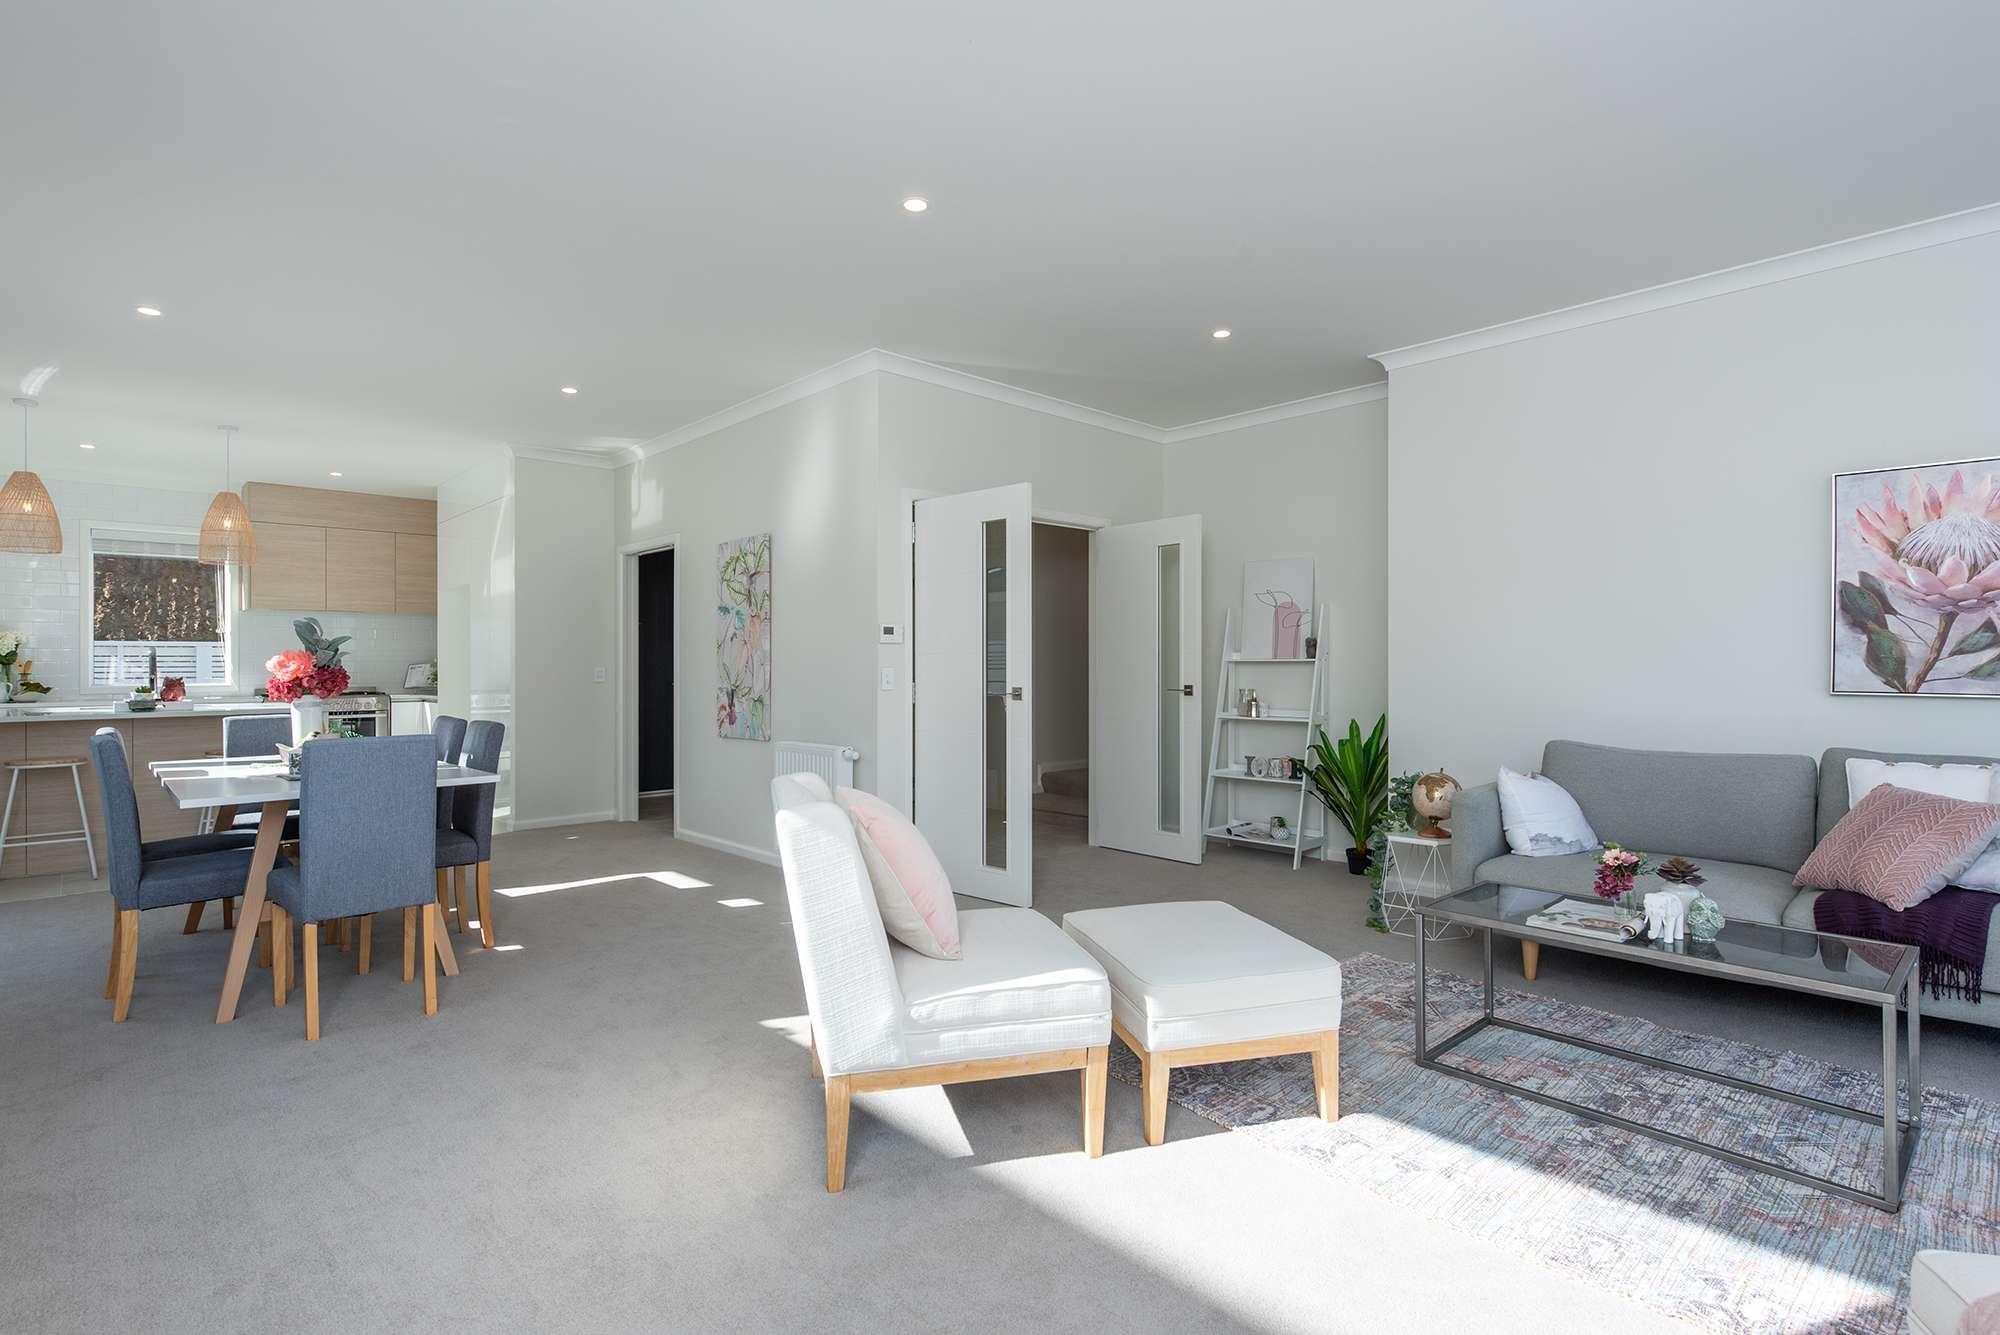 14 Farnworth Terrace, Churton Park, Wellington City 6037